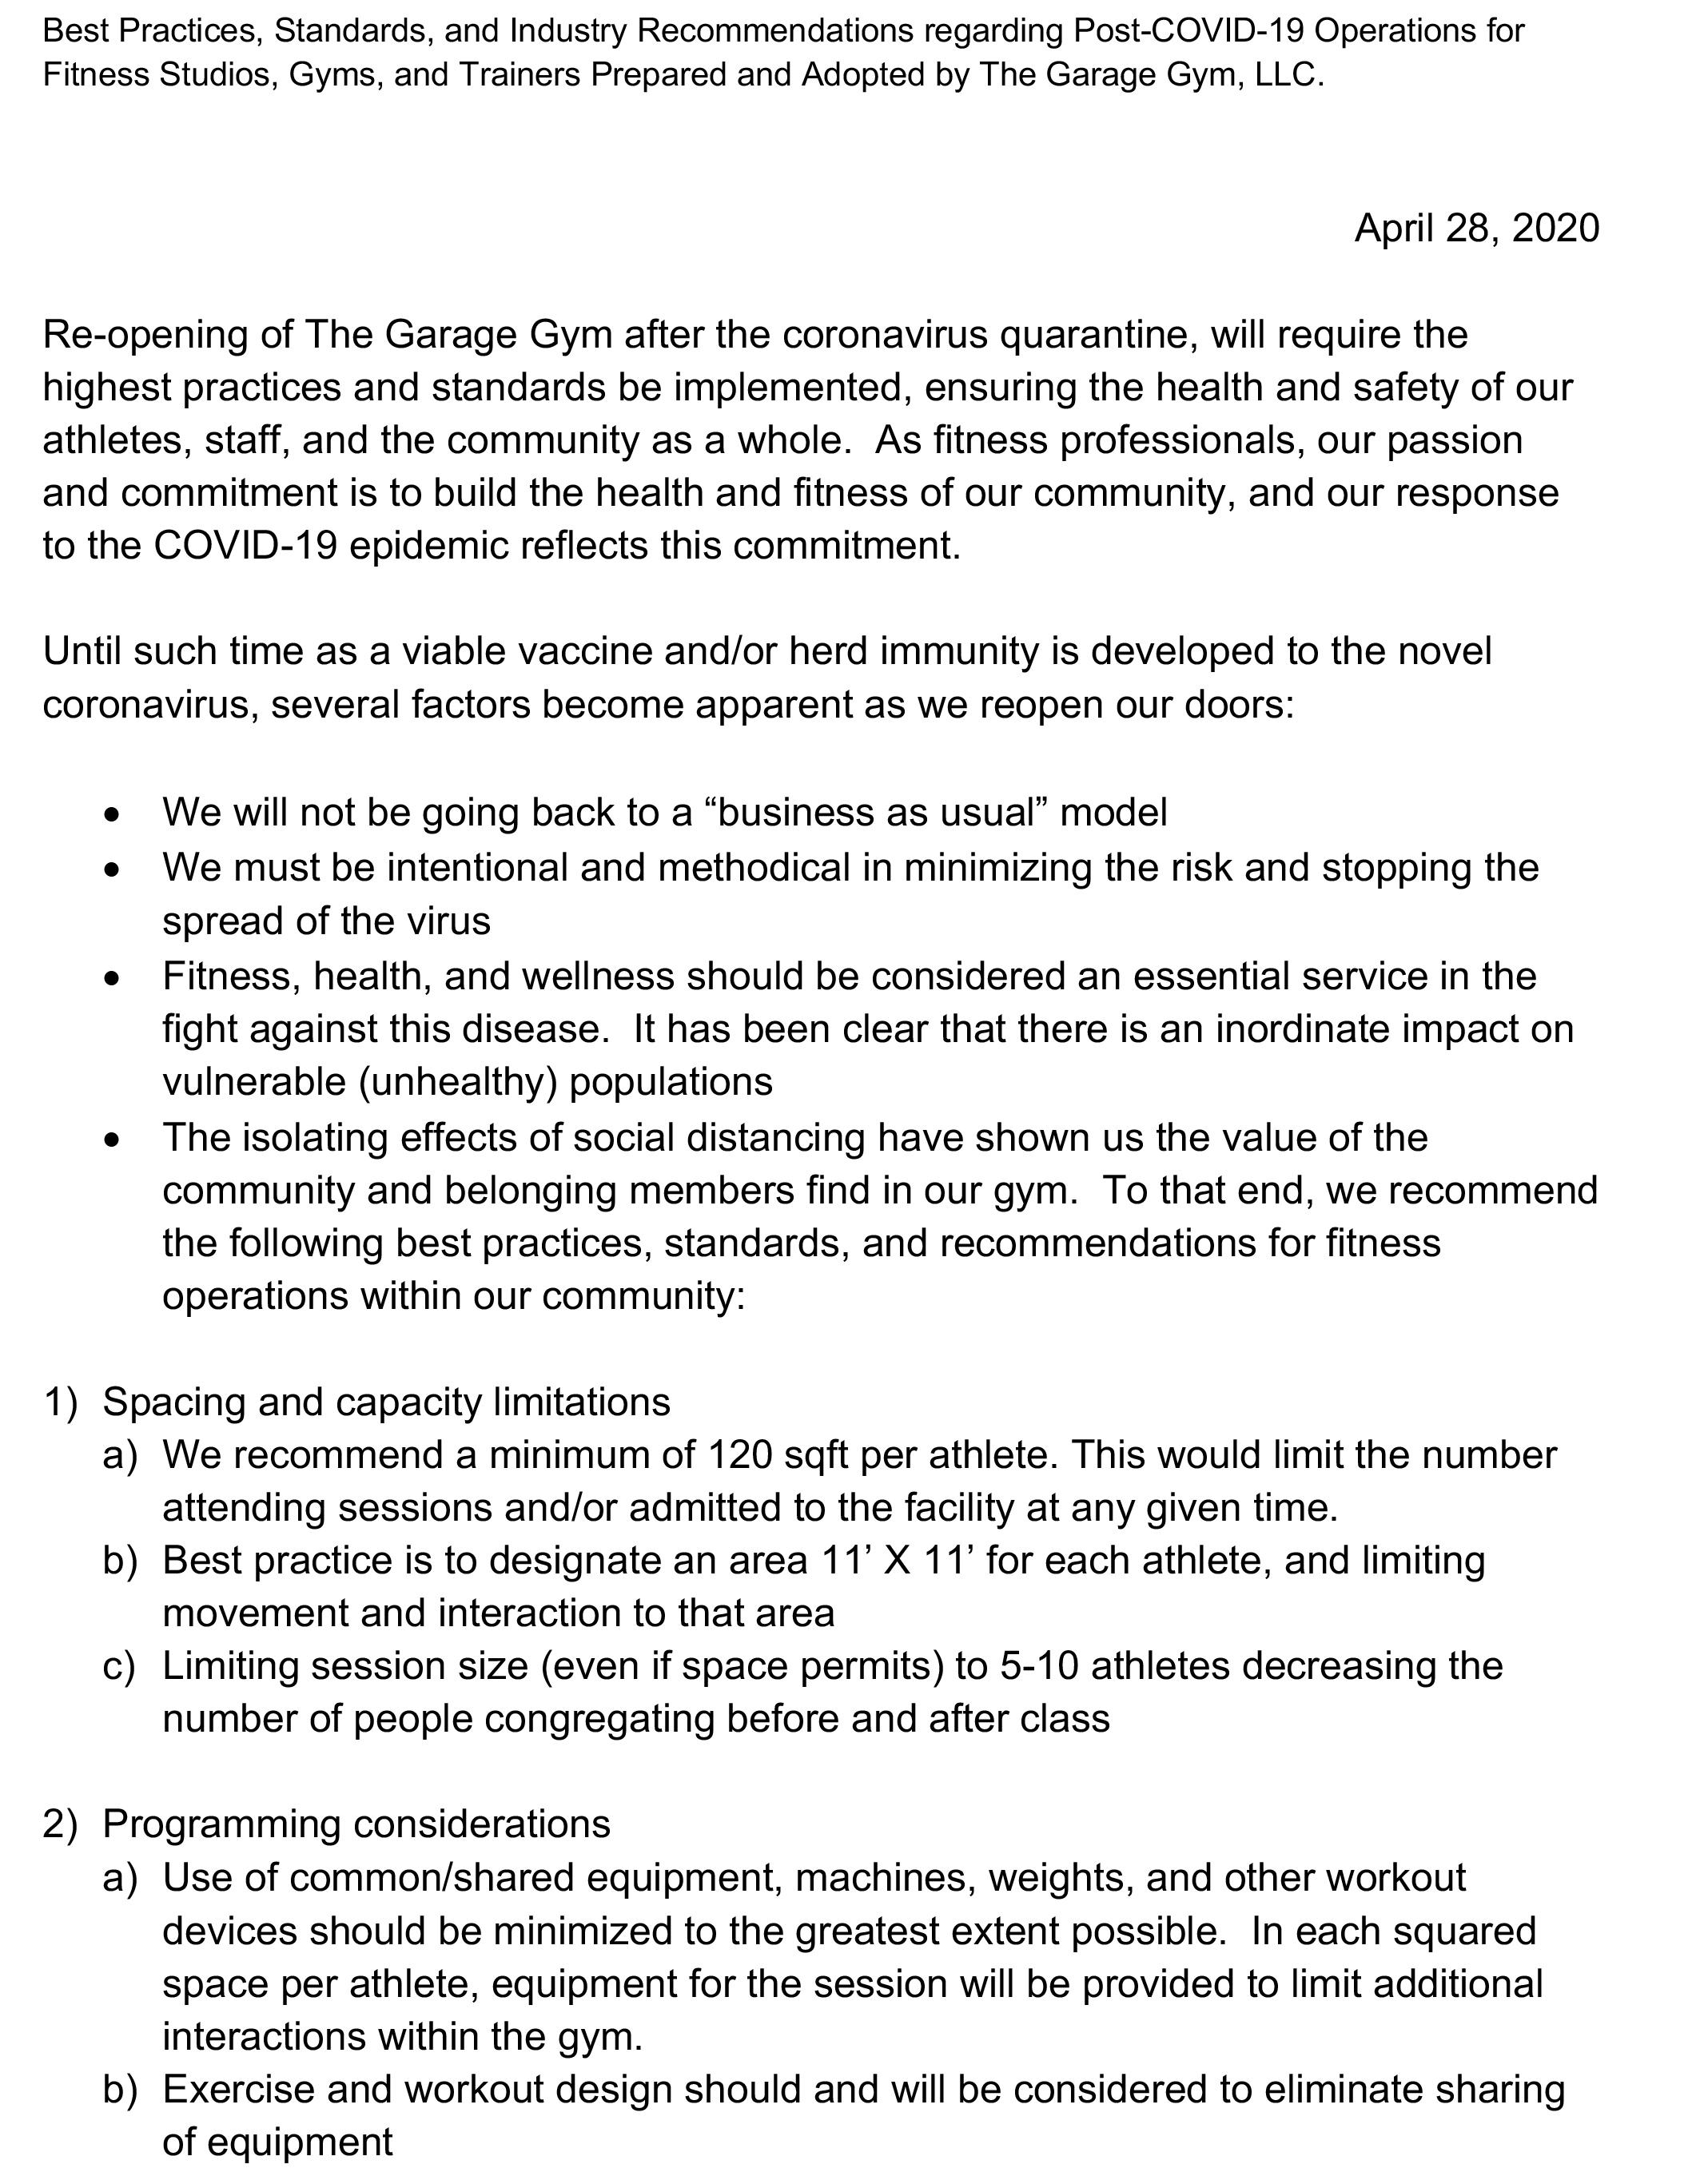 https://0201.nccdn.net/1_2/000/000/0c3/f24/Best-Practices---Google-Docs-1.jpg